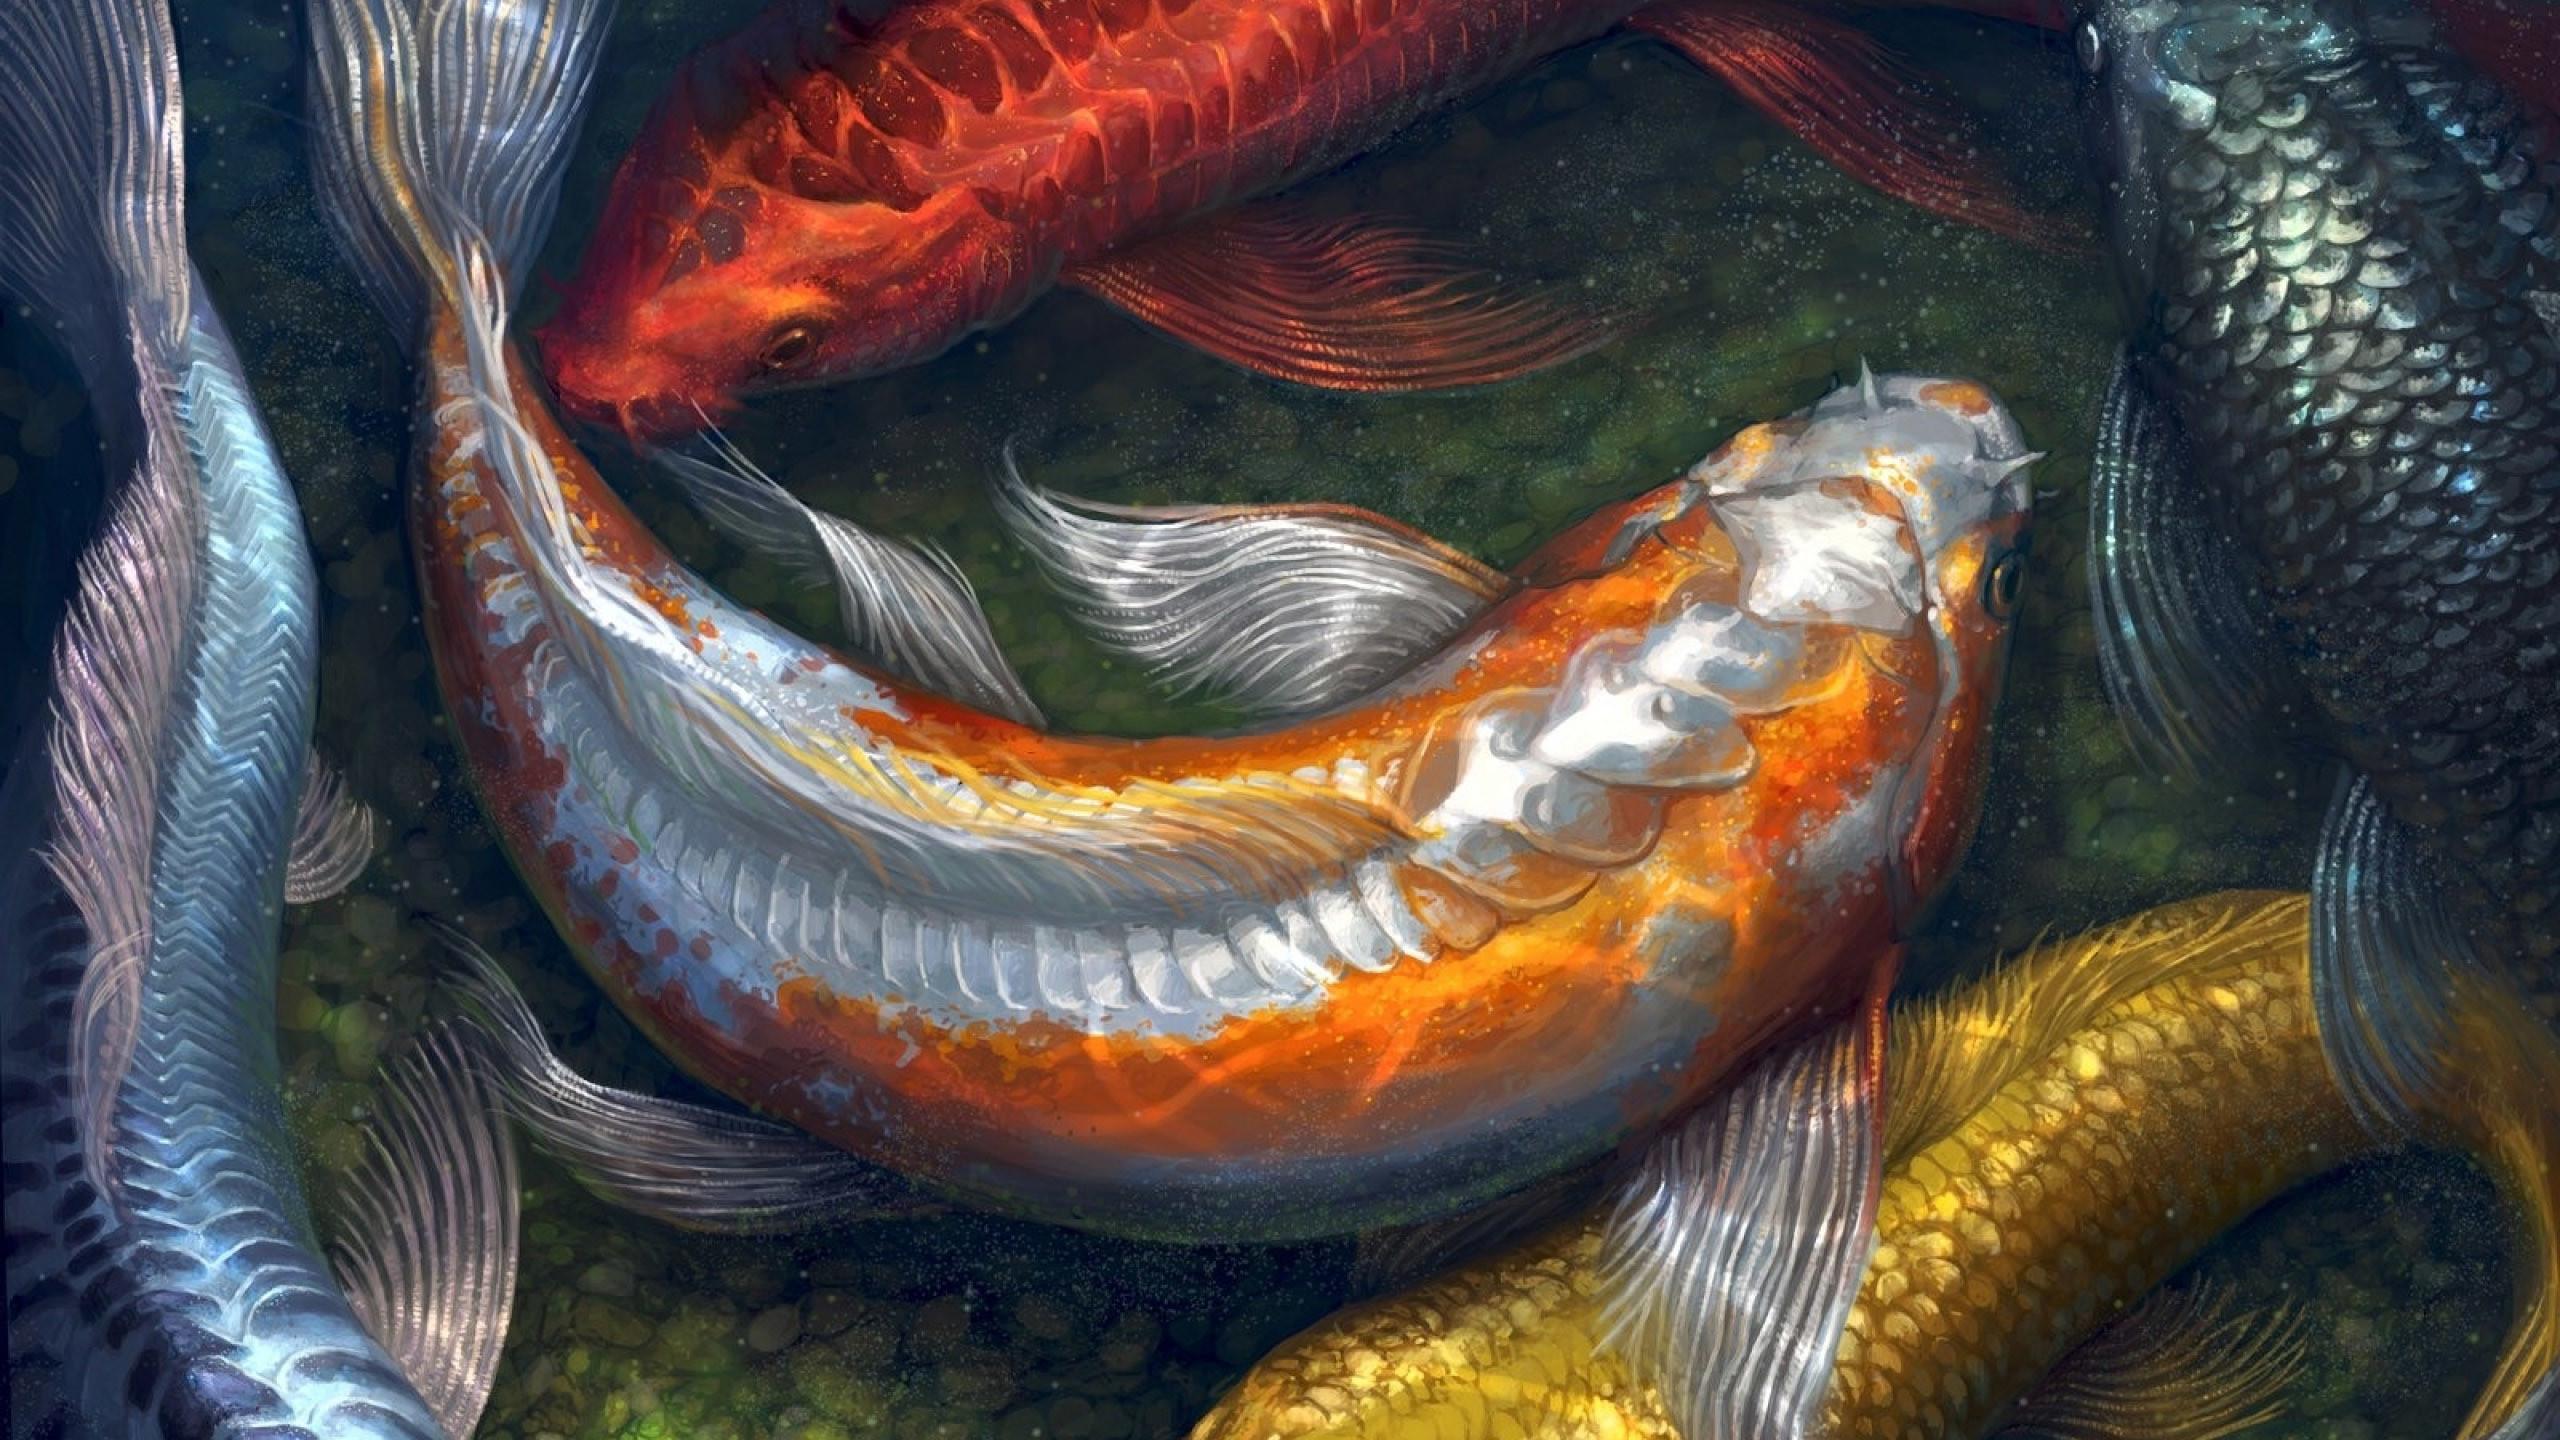 Hd Koi Fish Wallpaper 54 Images